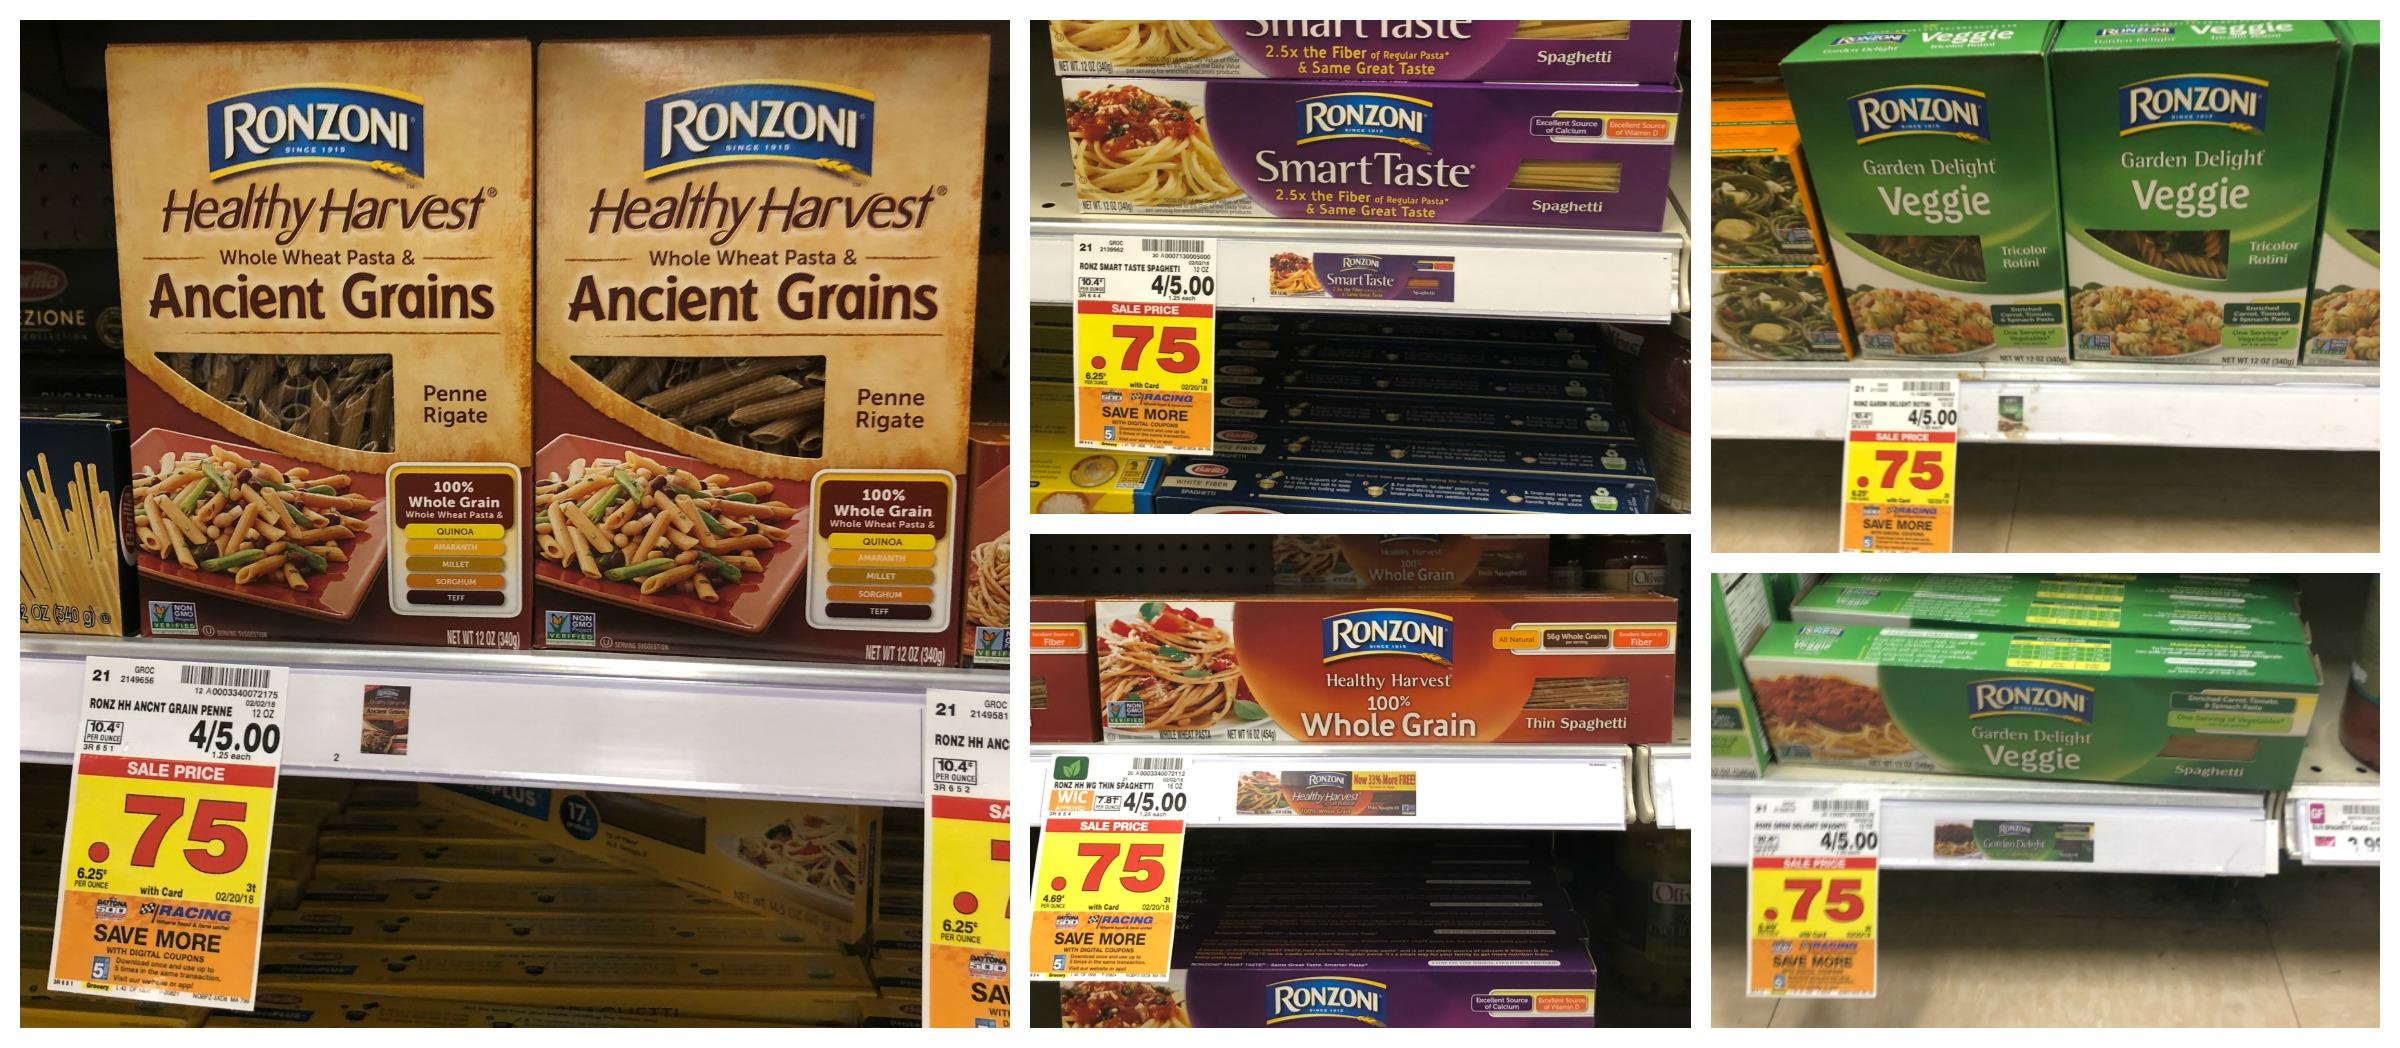 Ronzoni Healthy Harvest, Ancient Grains, Garden Delight and Smart ...